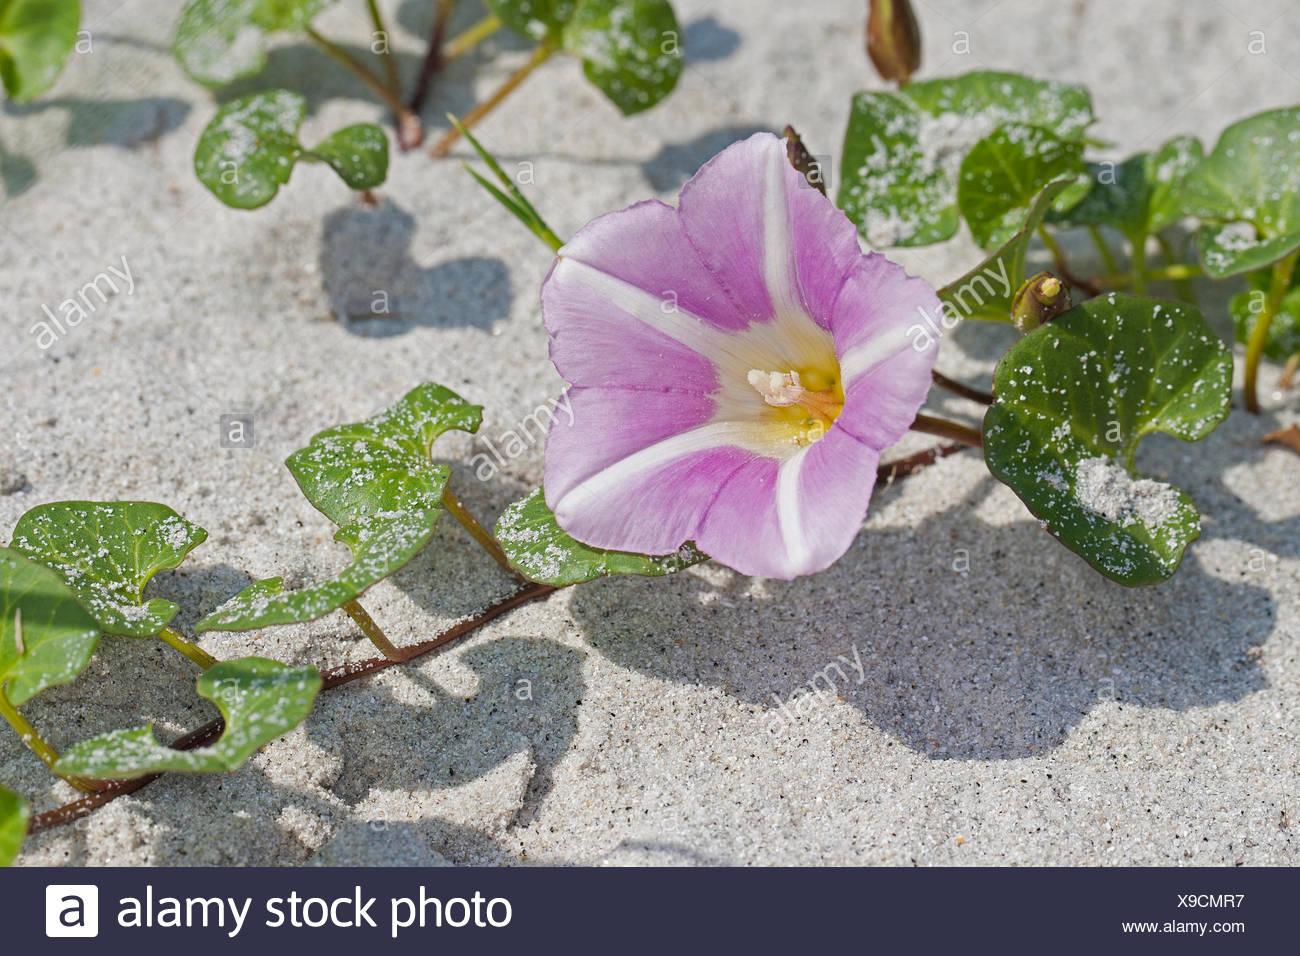 Beach morning-glory, Sea bindweed, Seashore false bindweed, Seashore morning-glory (Calystegia soldanella, Convolvulus soldanella), blooming, Germany - Stock Image